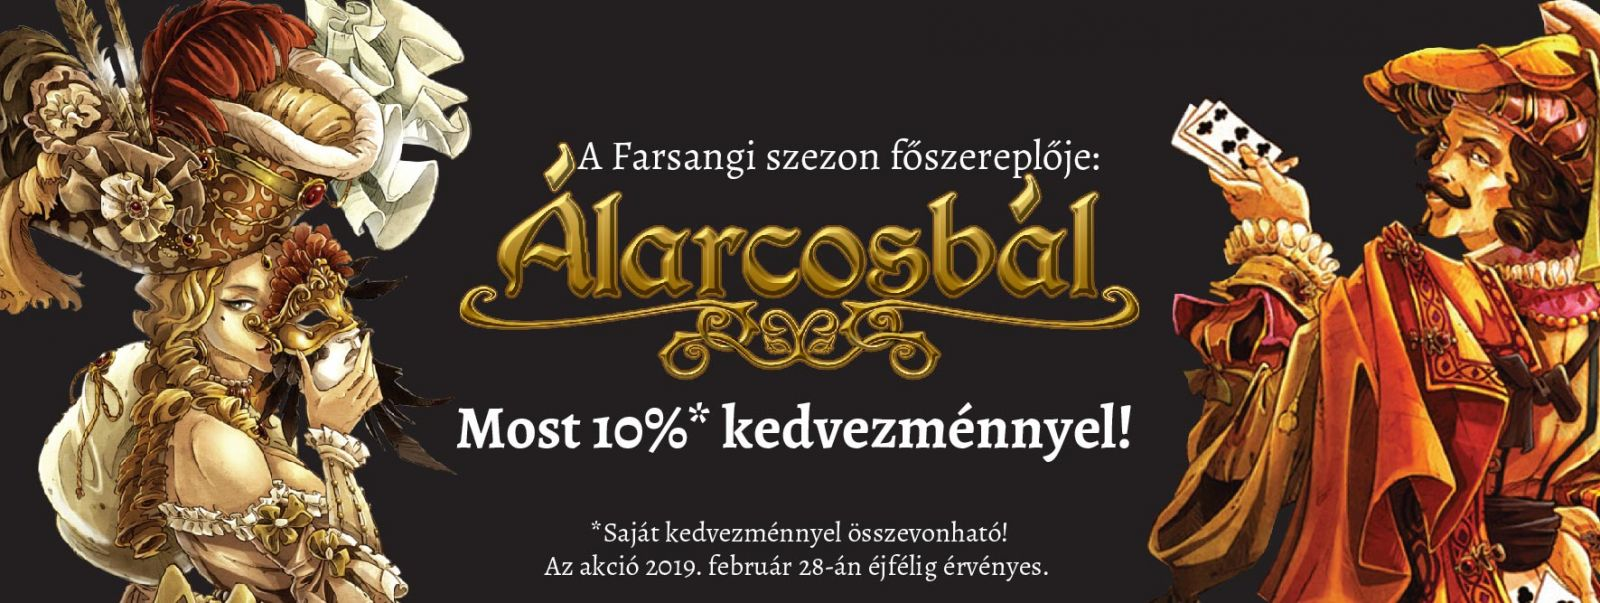 Farsang Álarcosbál 19